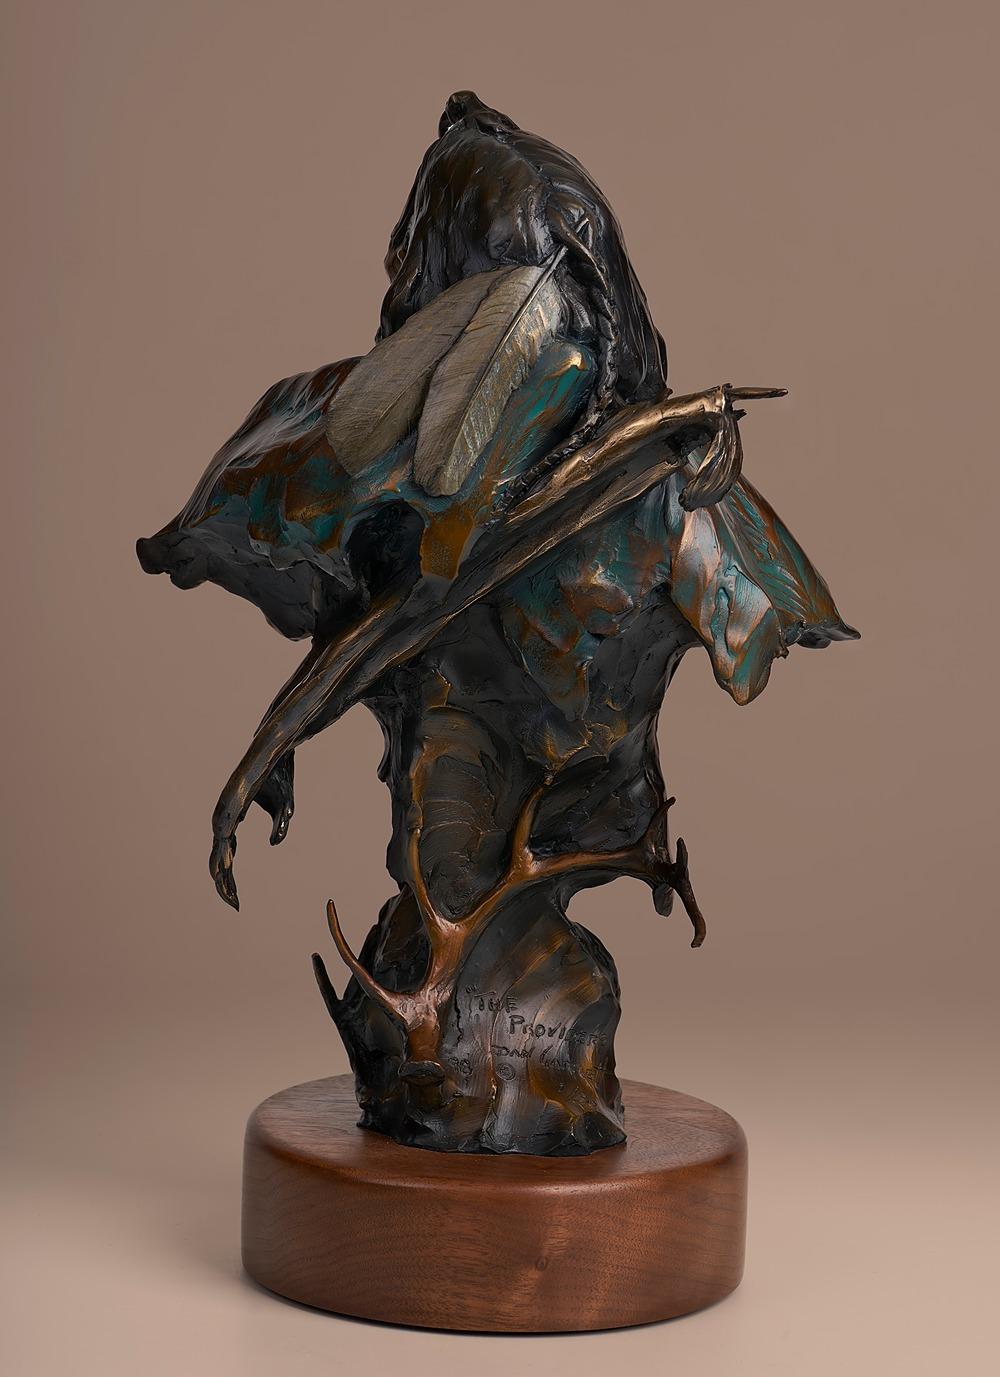 The Provider by Dan Garrett   ArtworkNetwork.com